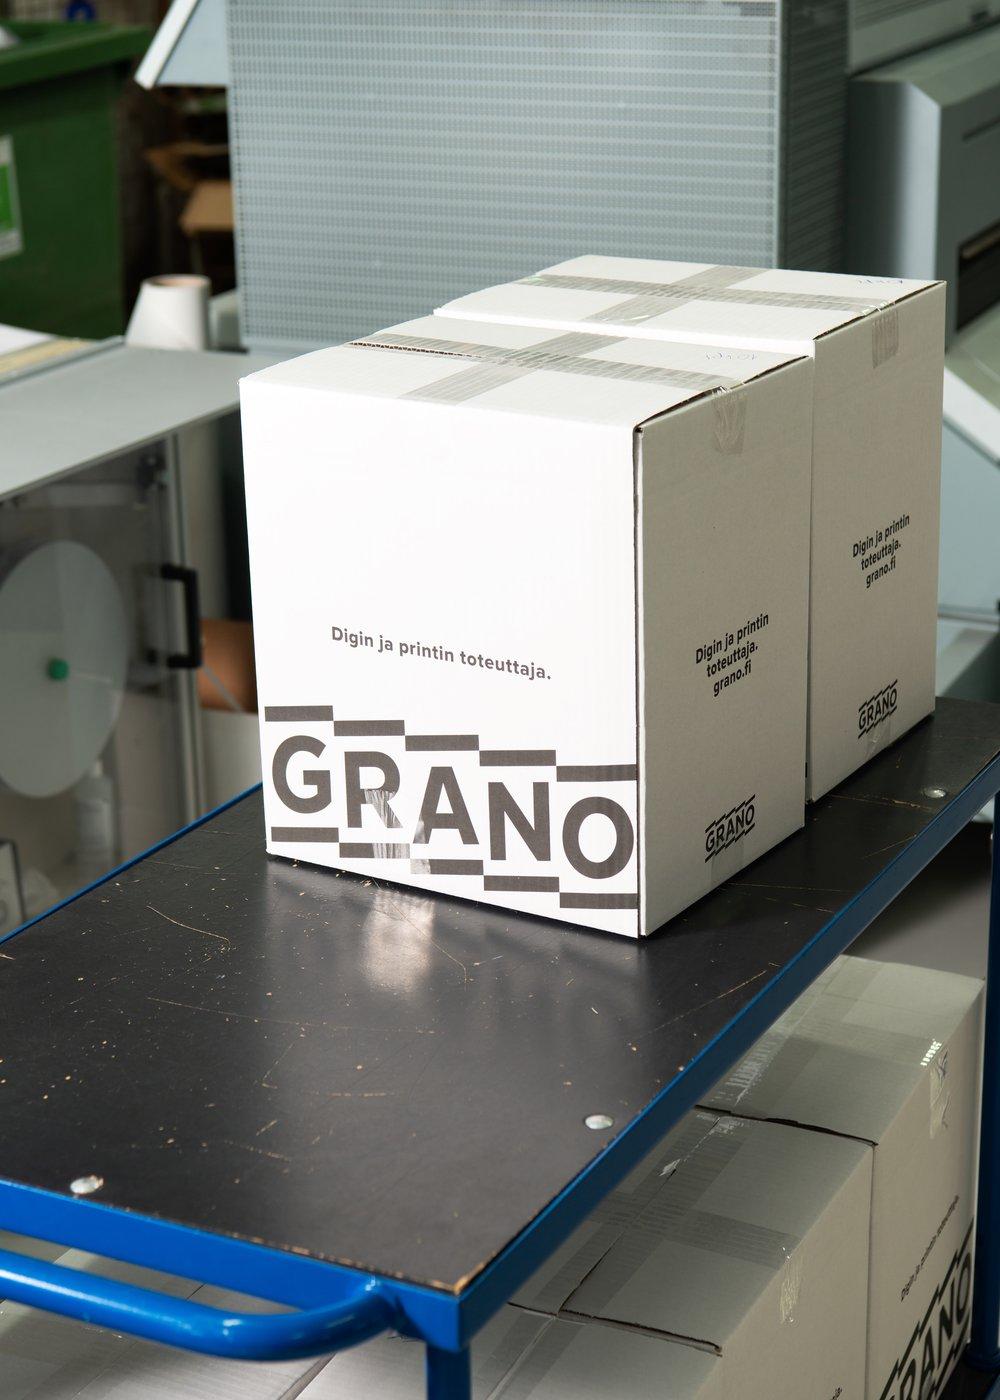 Grano_production_0007.jpg